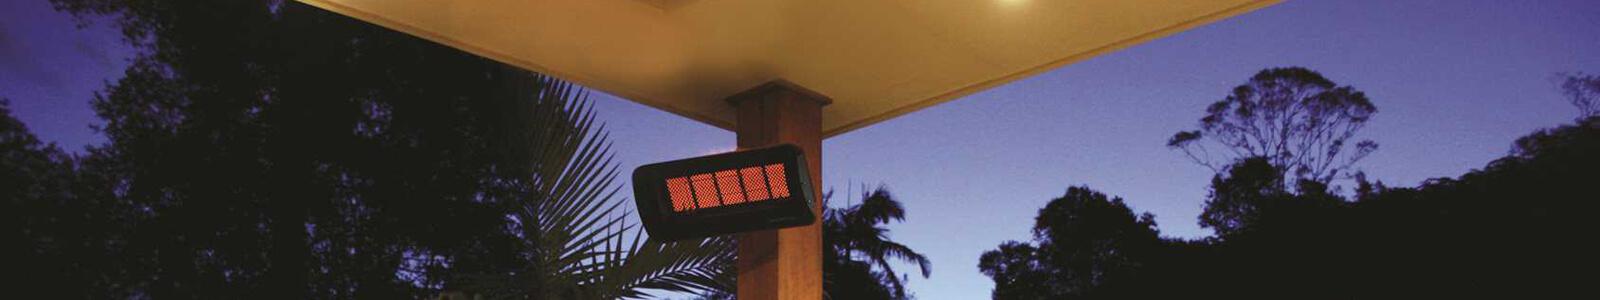 Bromic Heating Banner